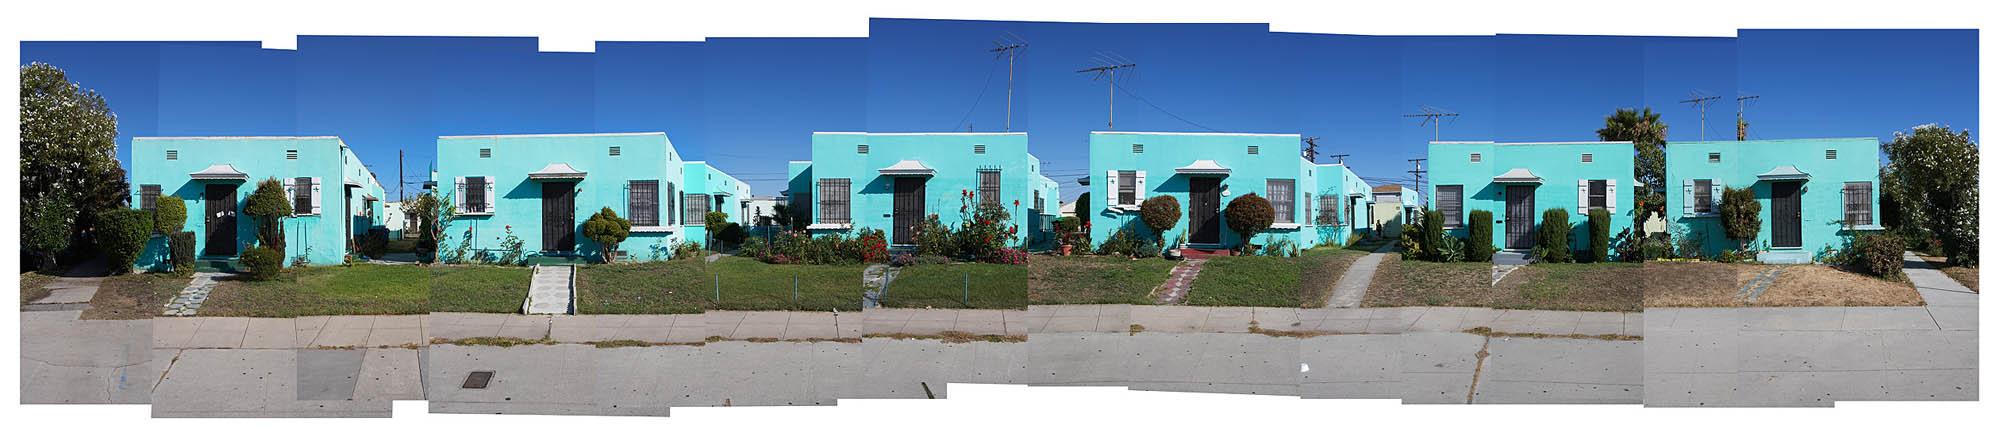 Venice Blvd. L.A.